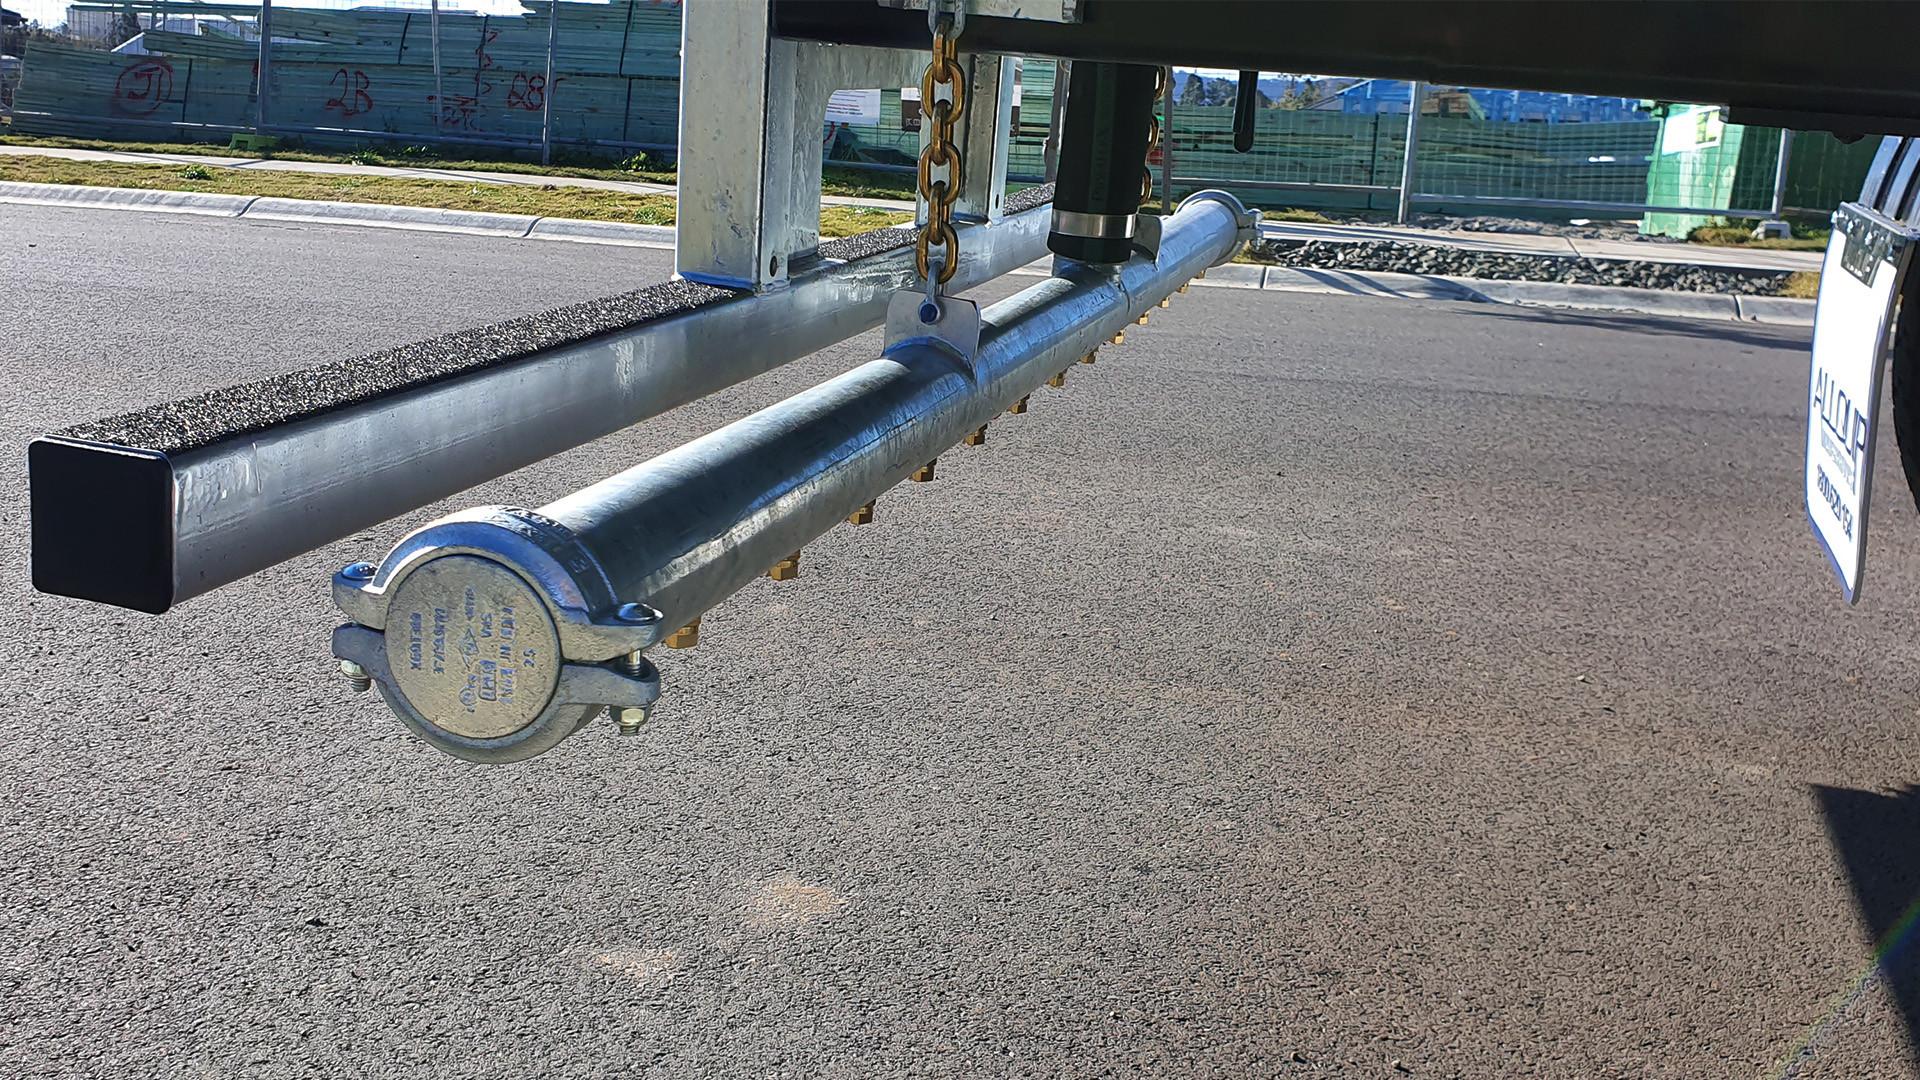 Isuzu 14,000Lt + Cannon - Photo 06.jpg